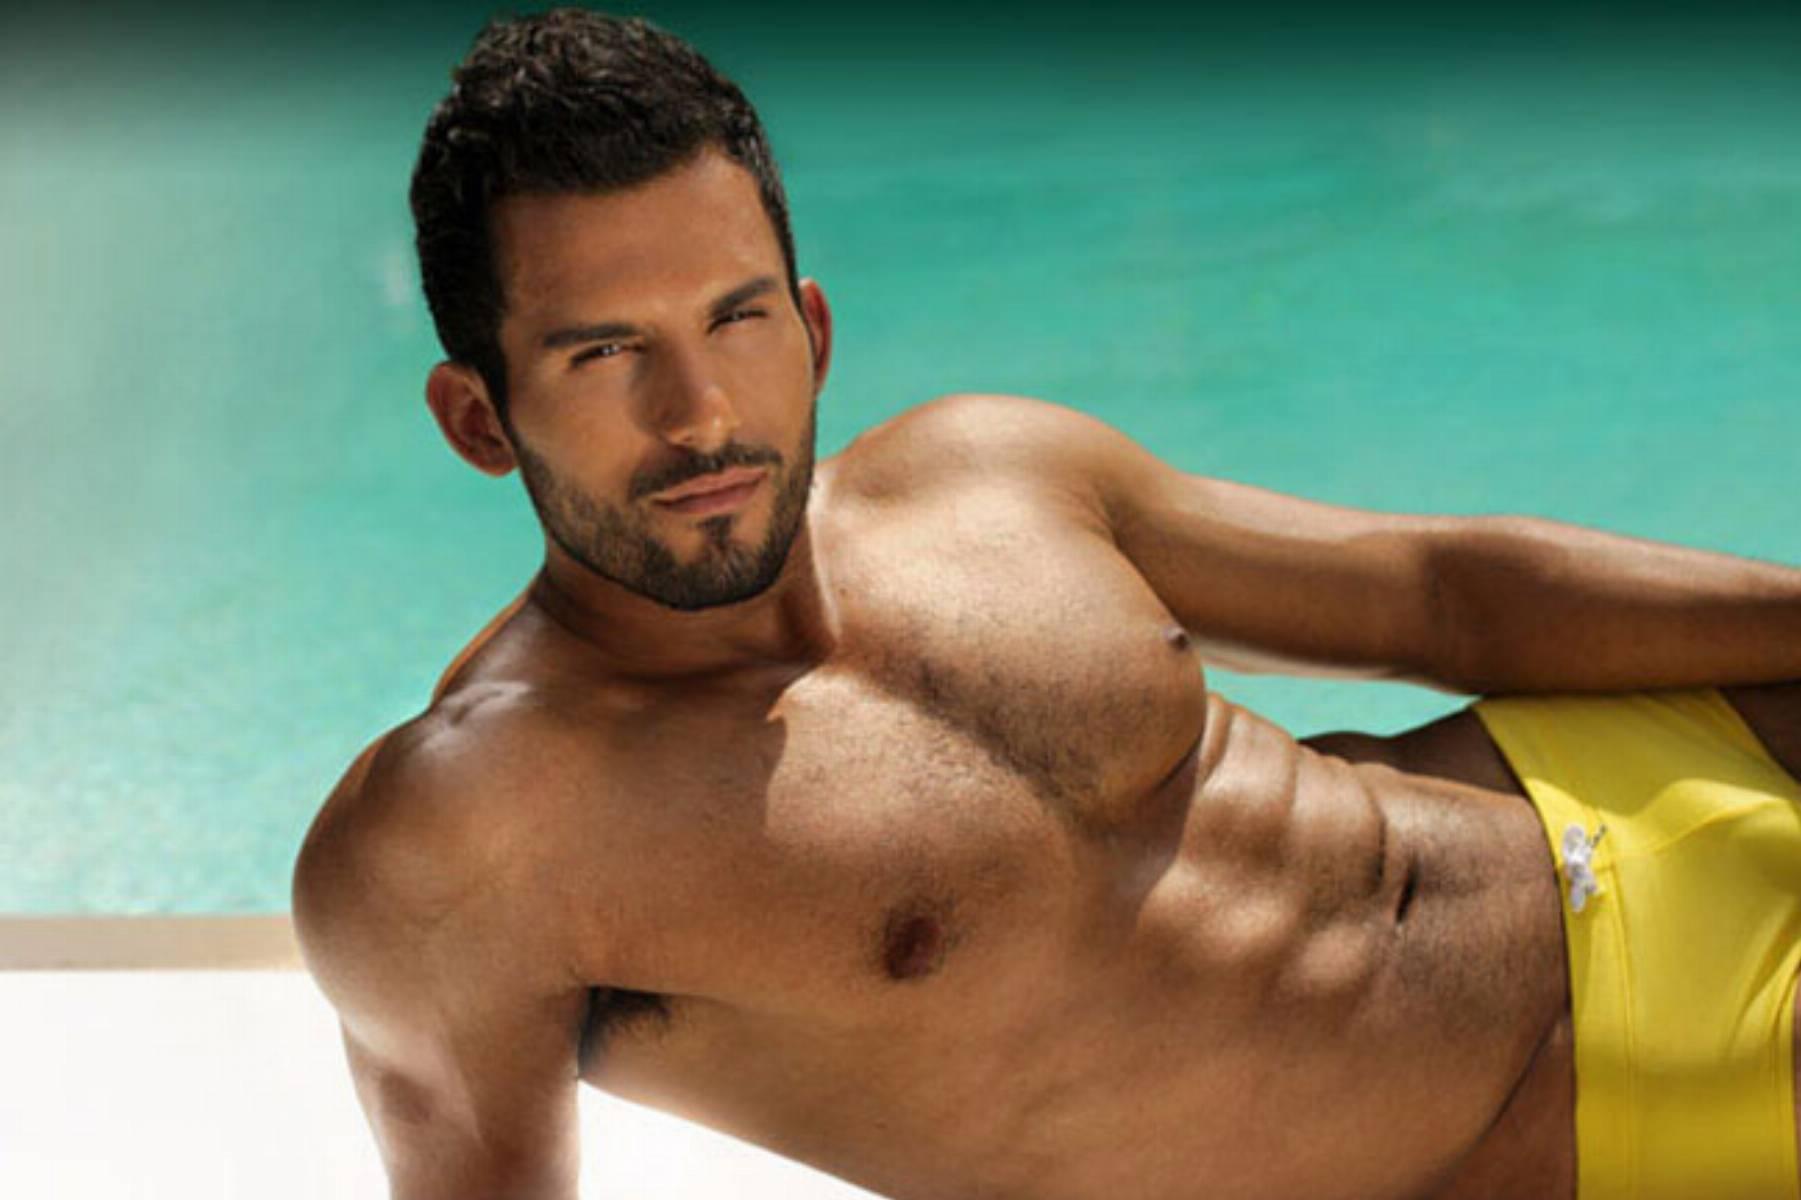 Gay men physical attributes